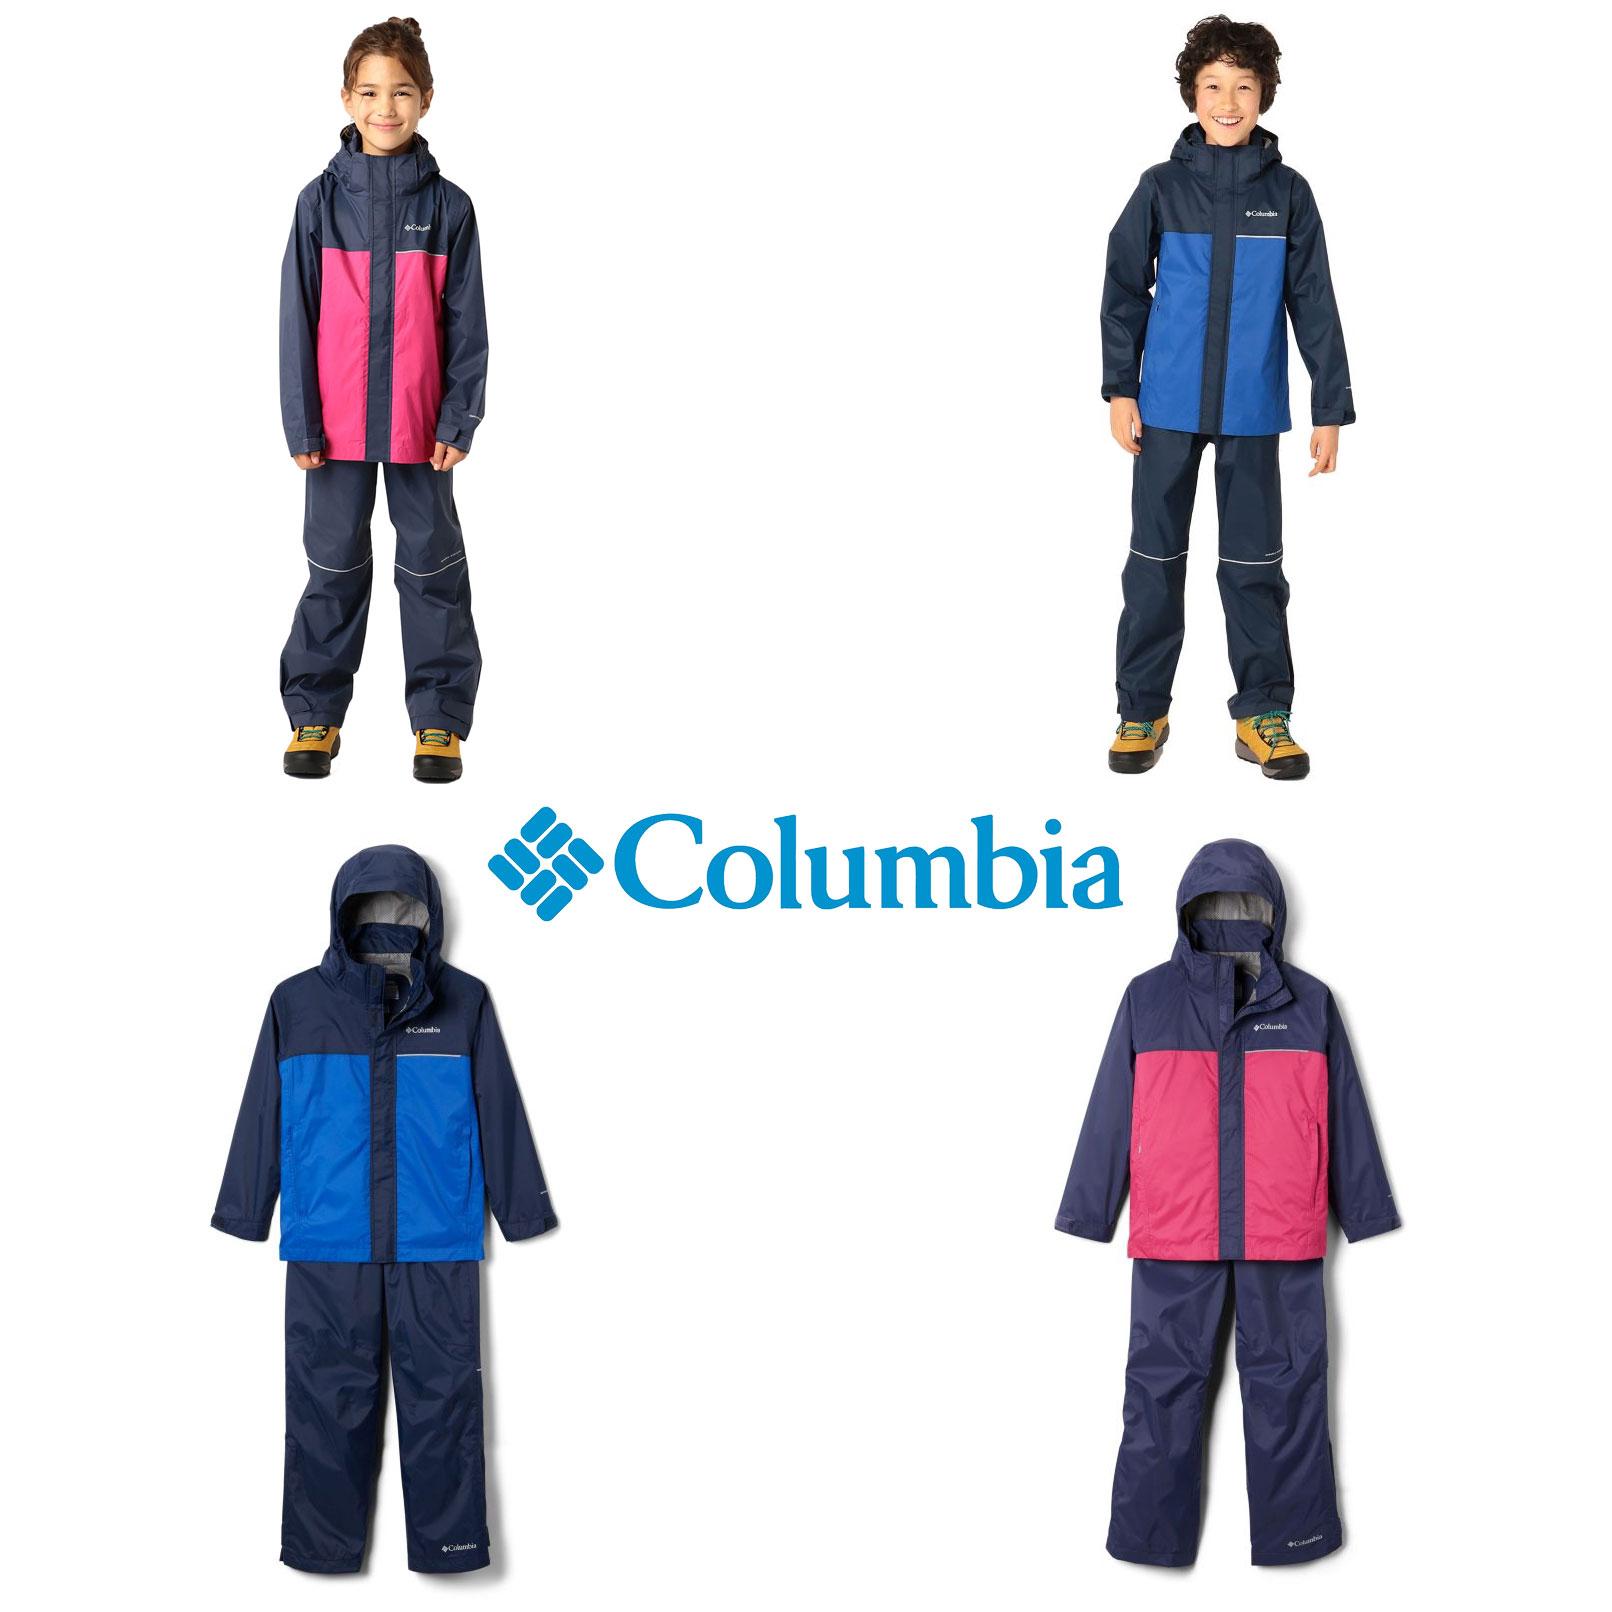 COLUMBIA 'Youth Simpson Sanctuary™ II Rain Set' - 2 kleuren [was €119]